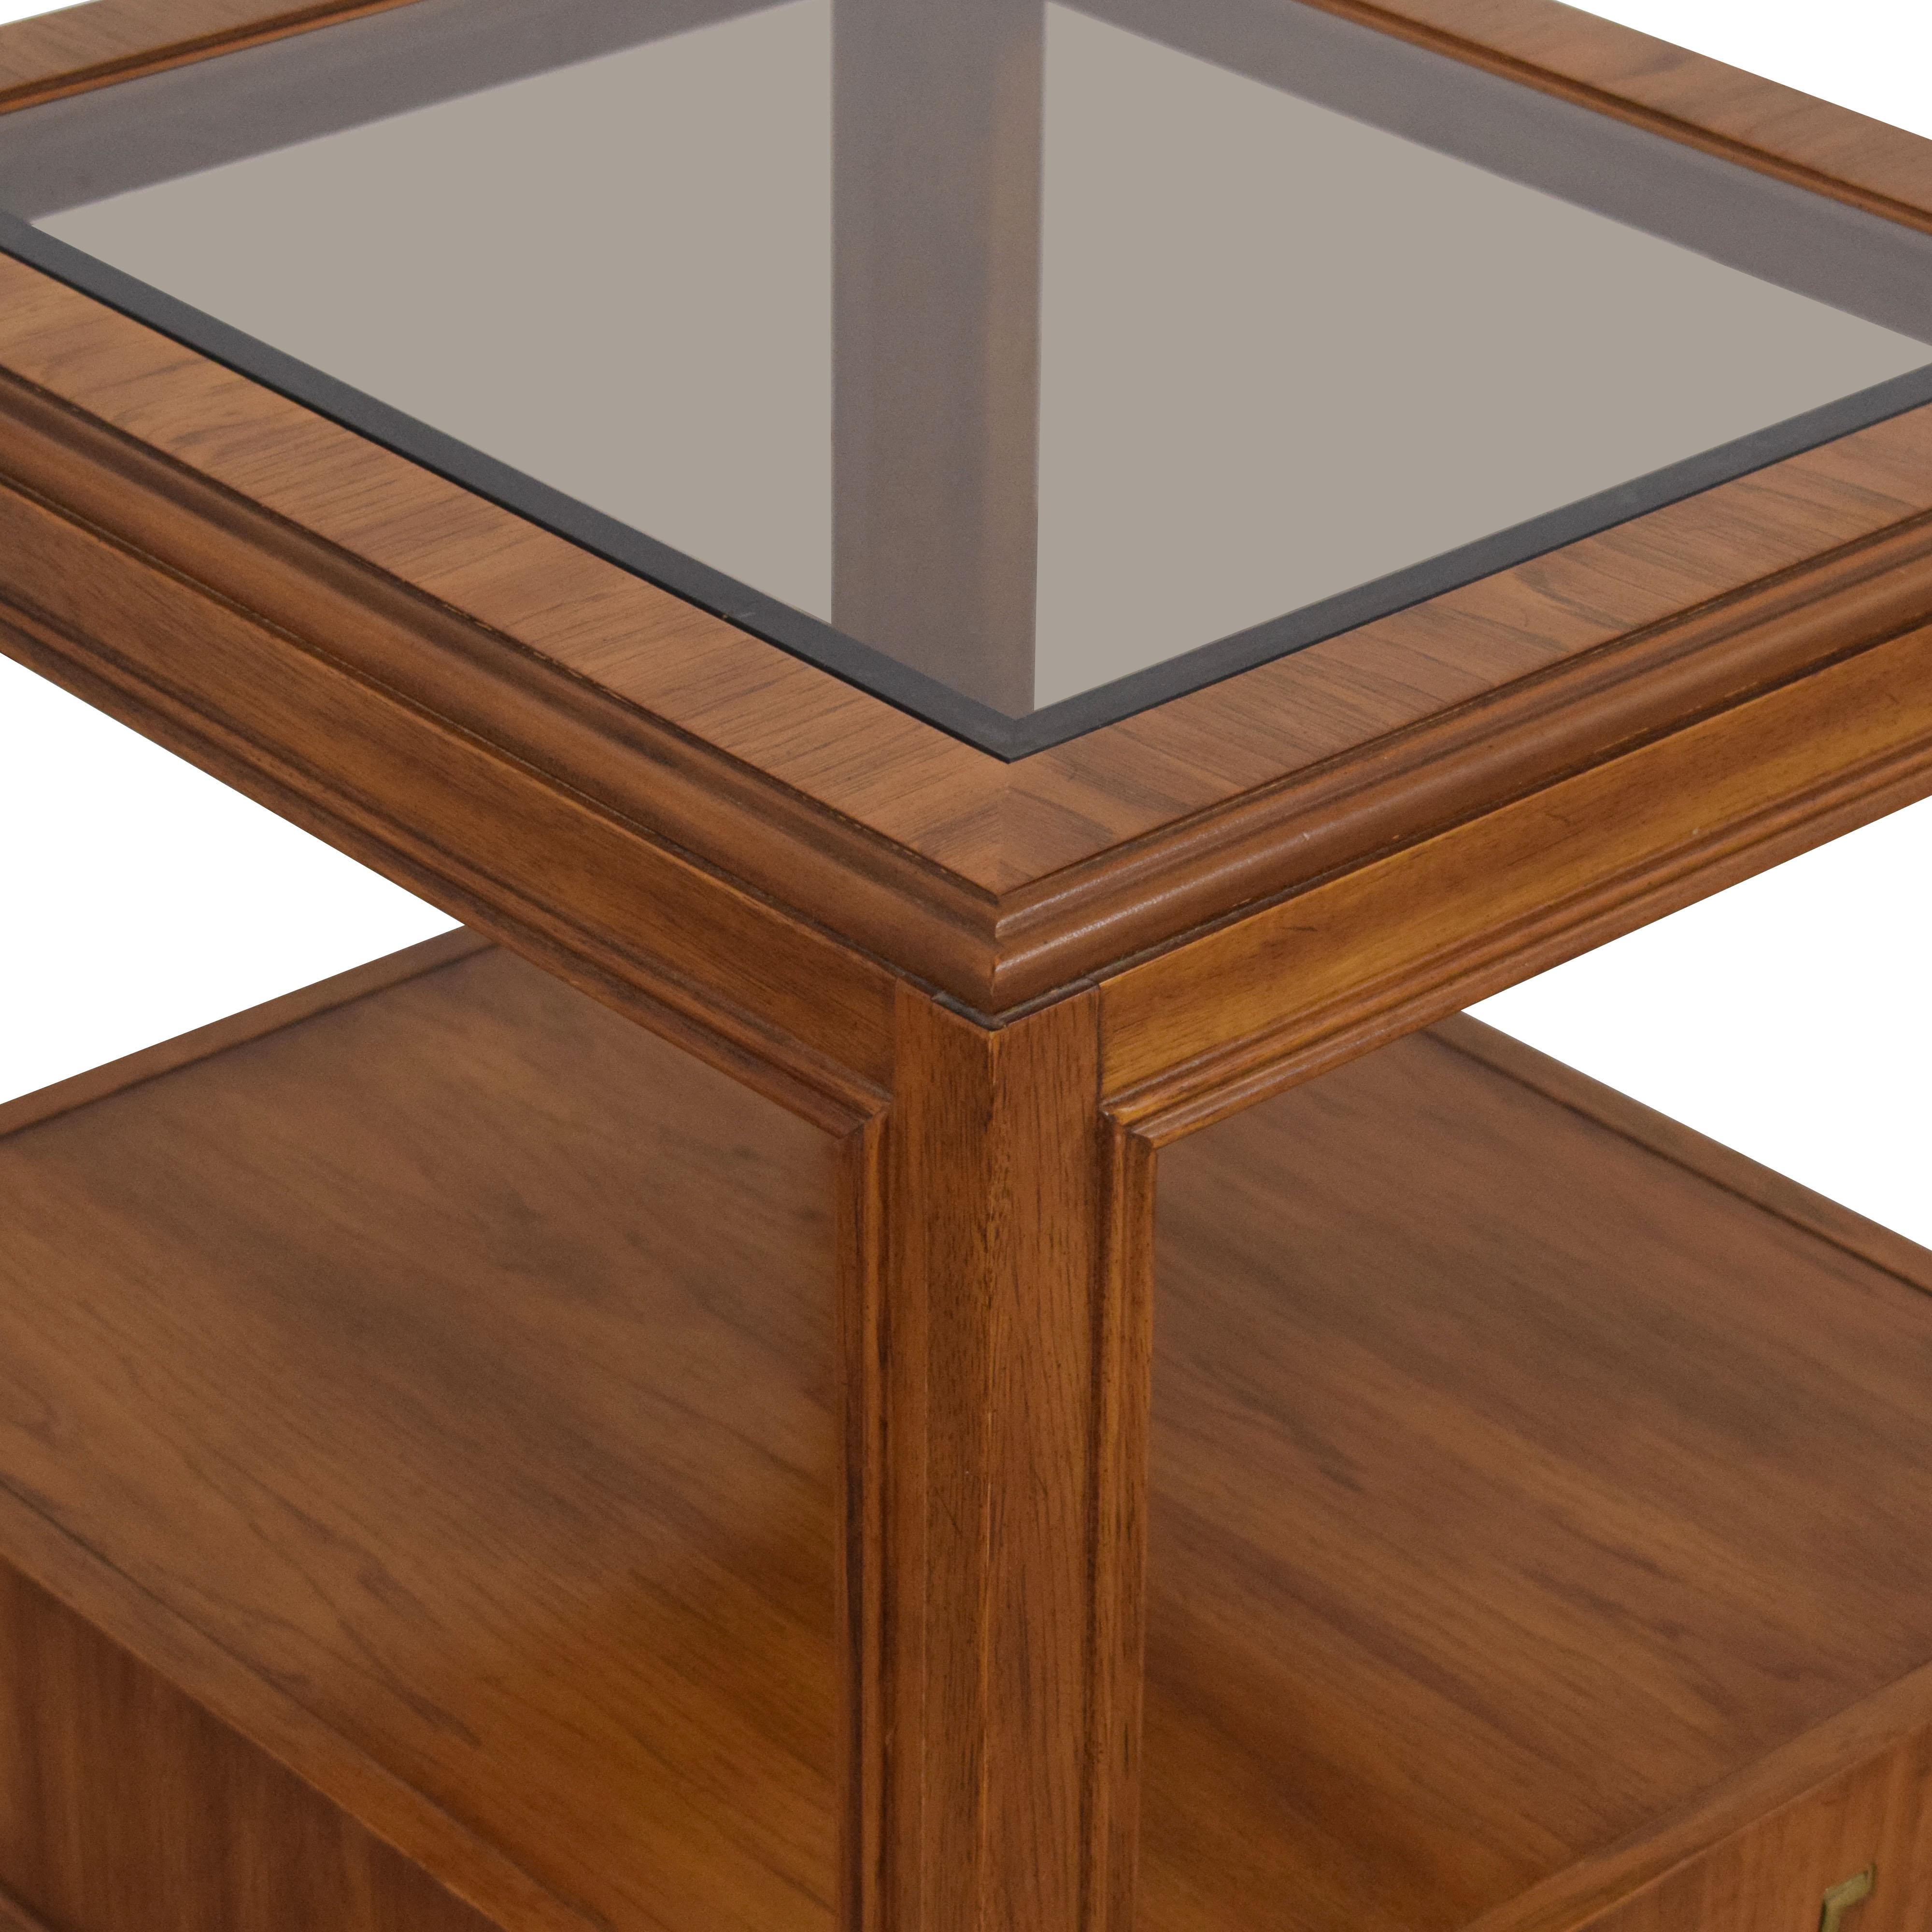 Drexel Heritage Drexel Heritage Glass Top Side Table on sale